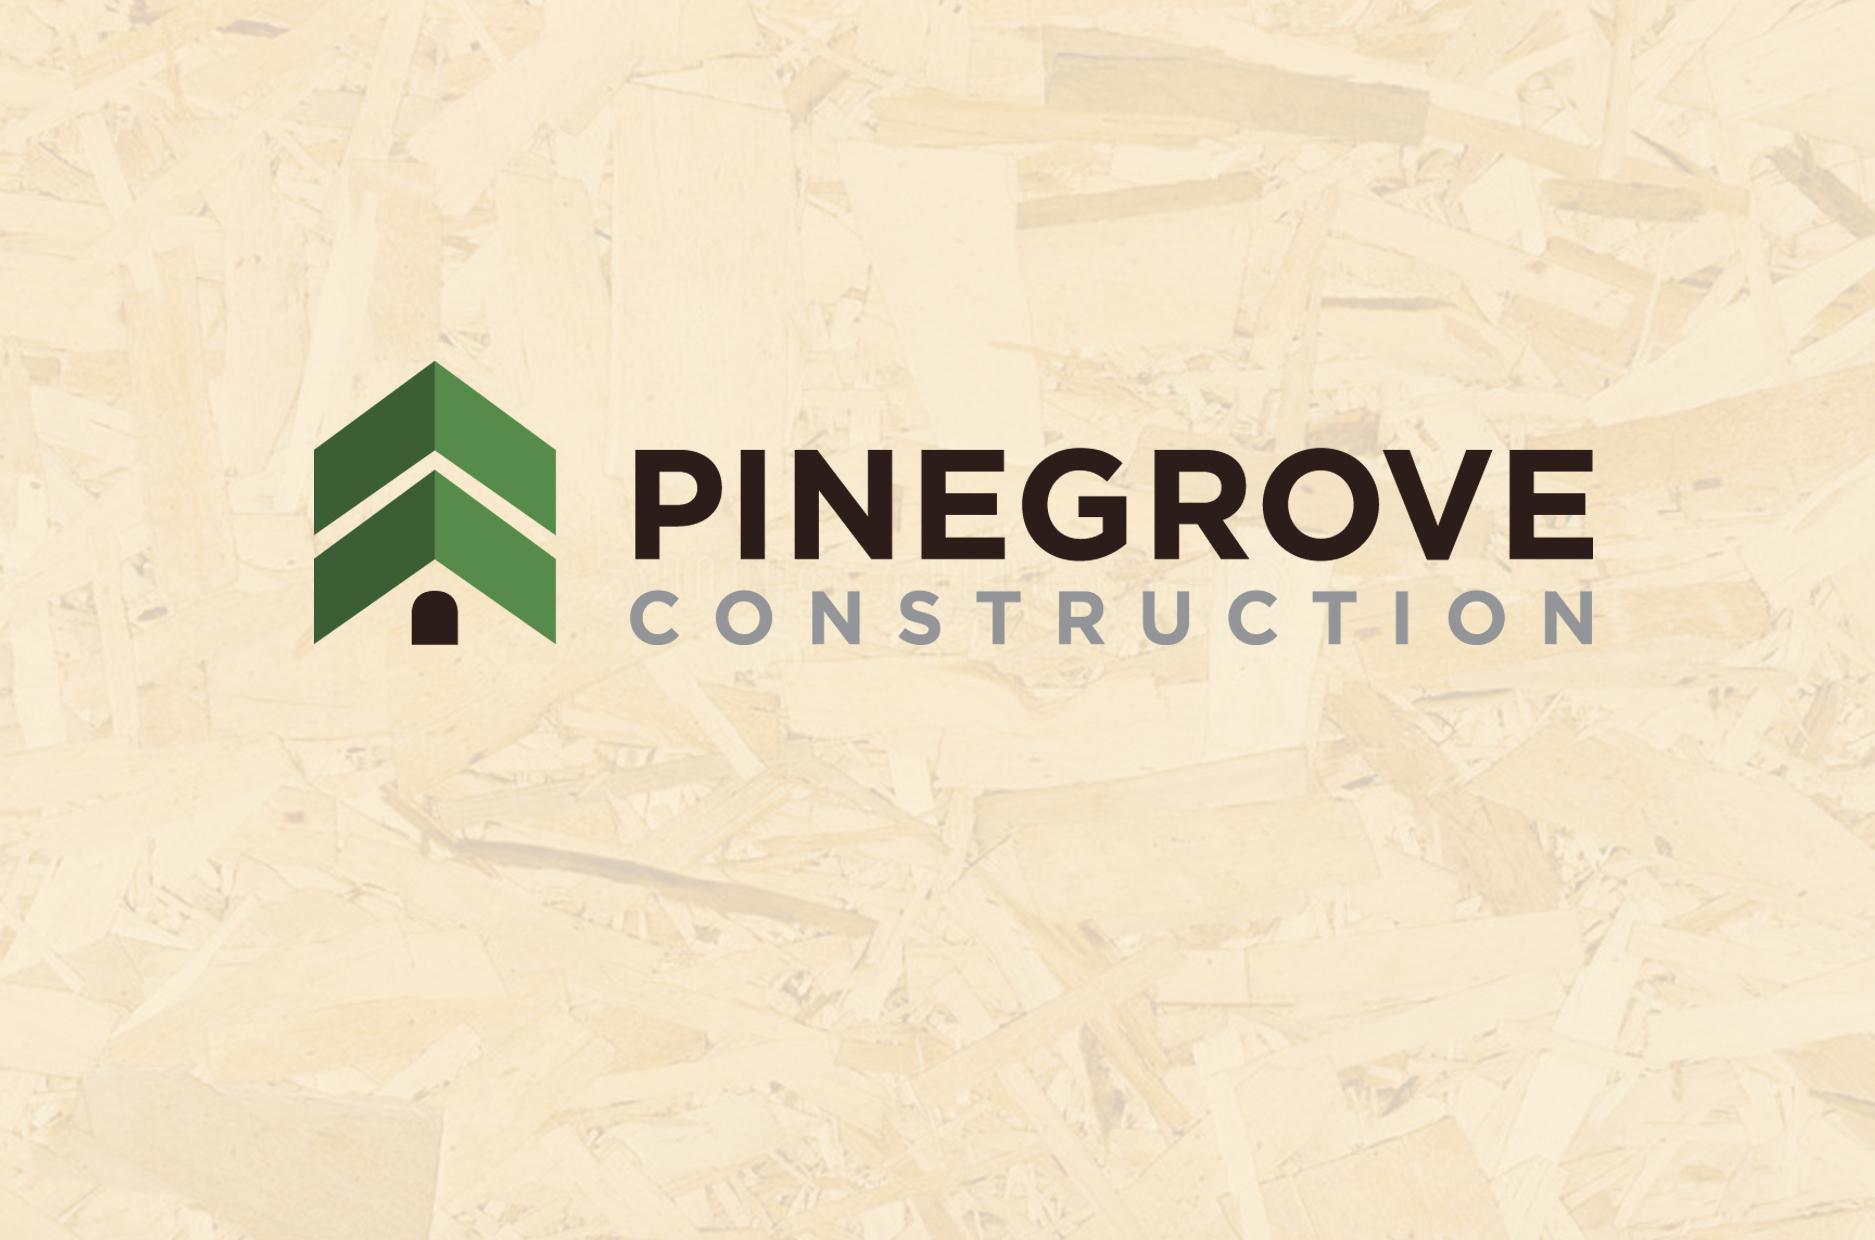 Pinegrove Construction